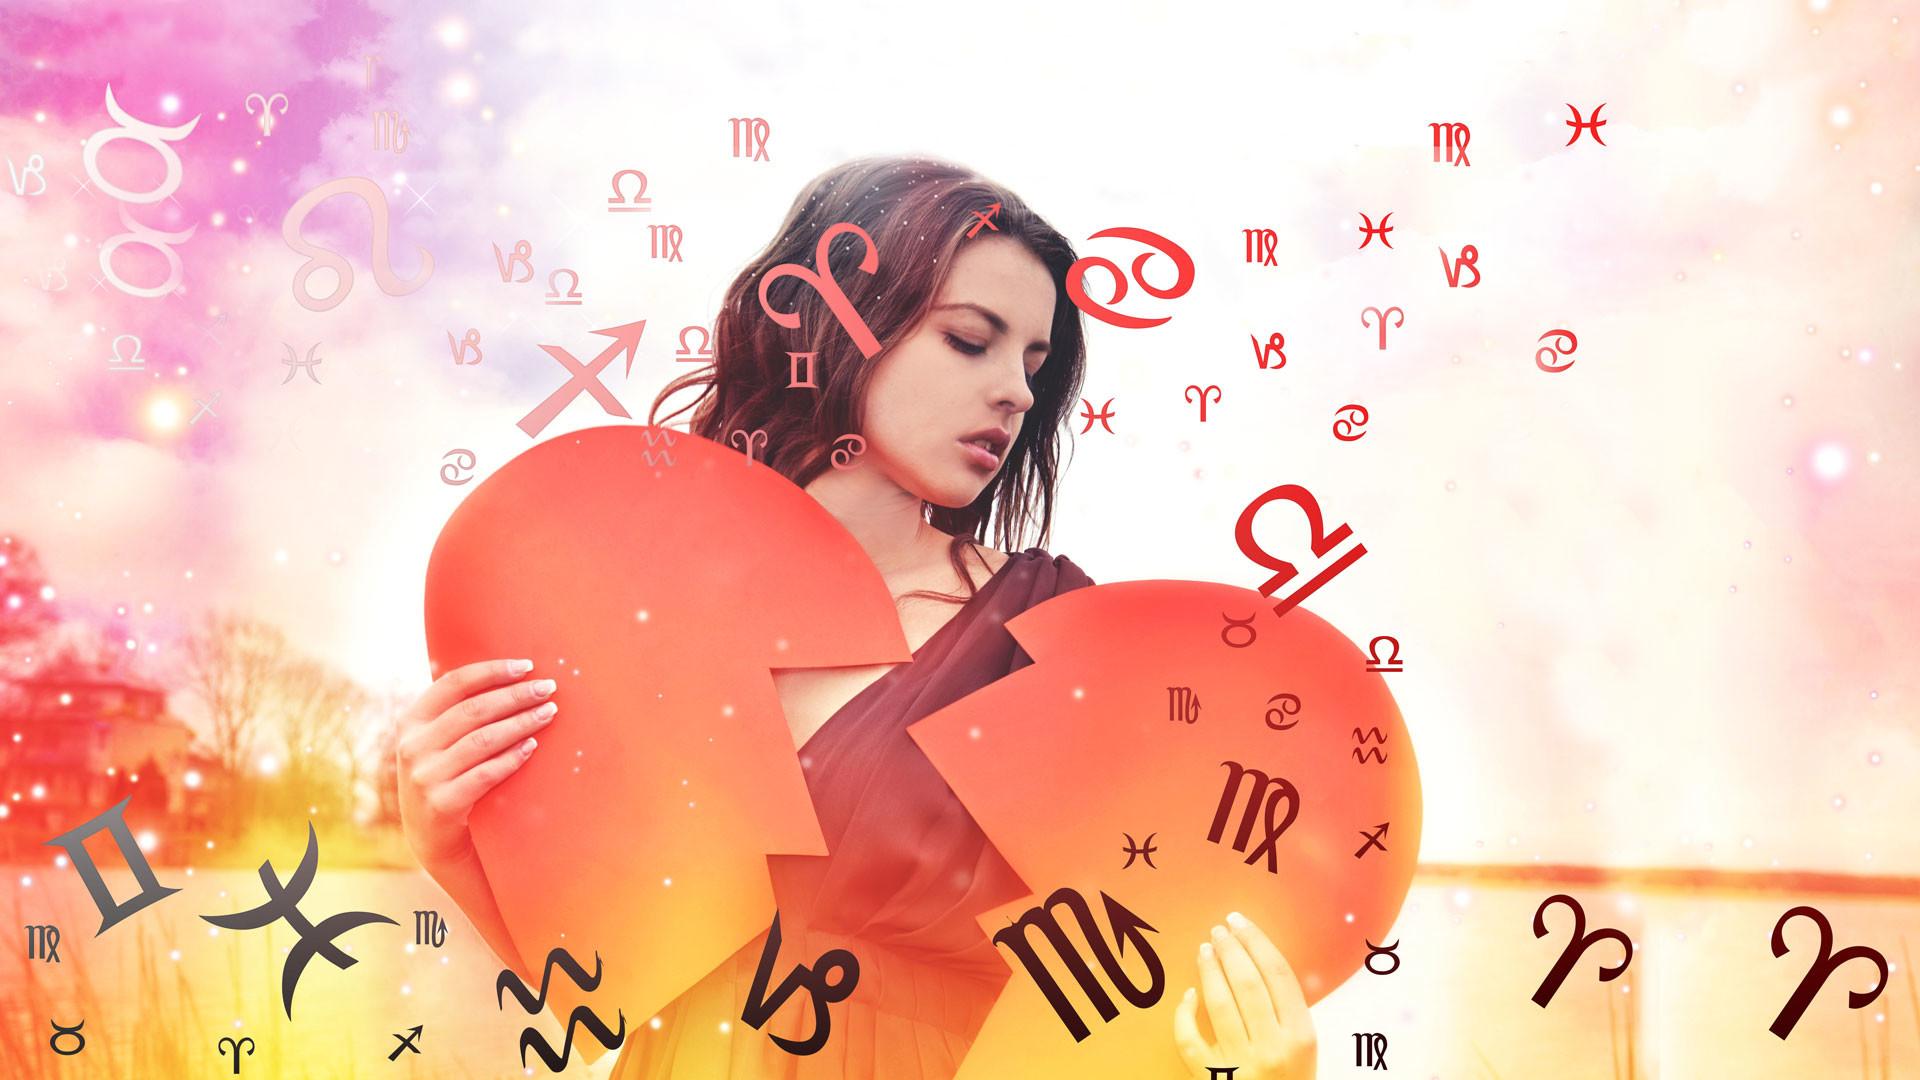 Гороскоп, разбитое сердце, девушка